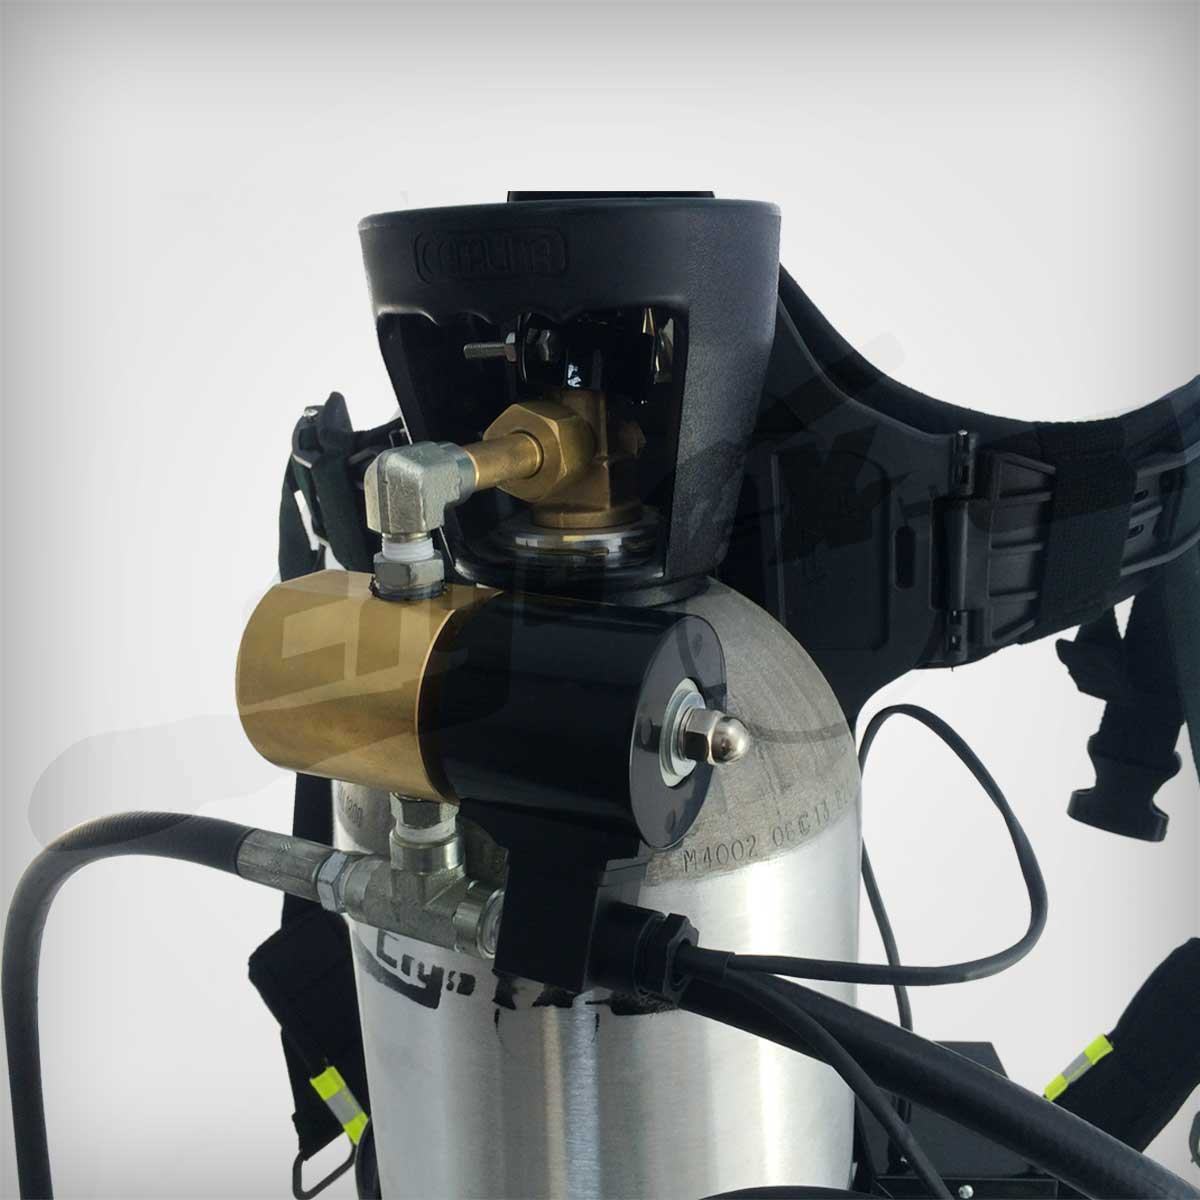 STAHLMANN Custom CO2 Special Effects Equipment Custom Designed and Built by CryoFX® Custom Tank